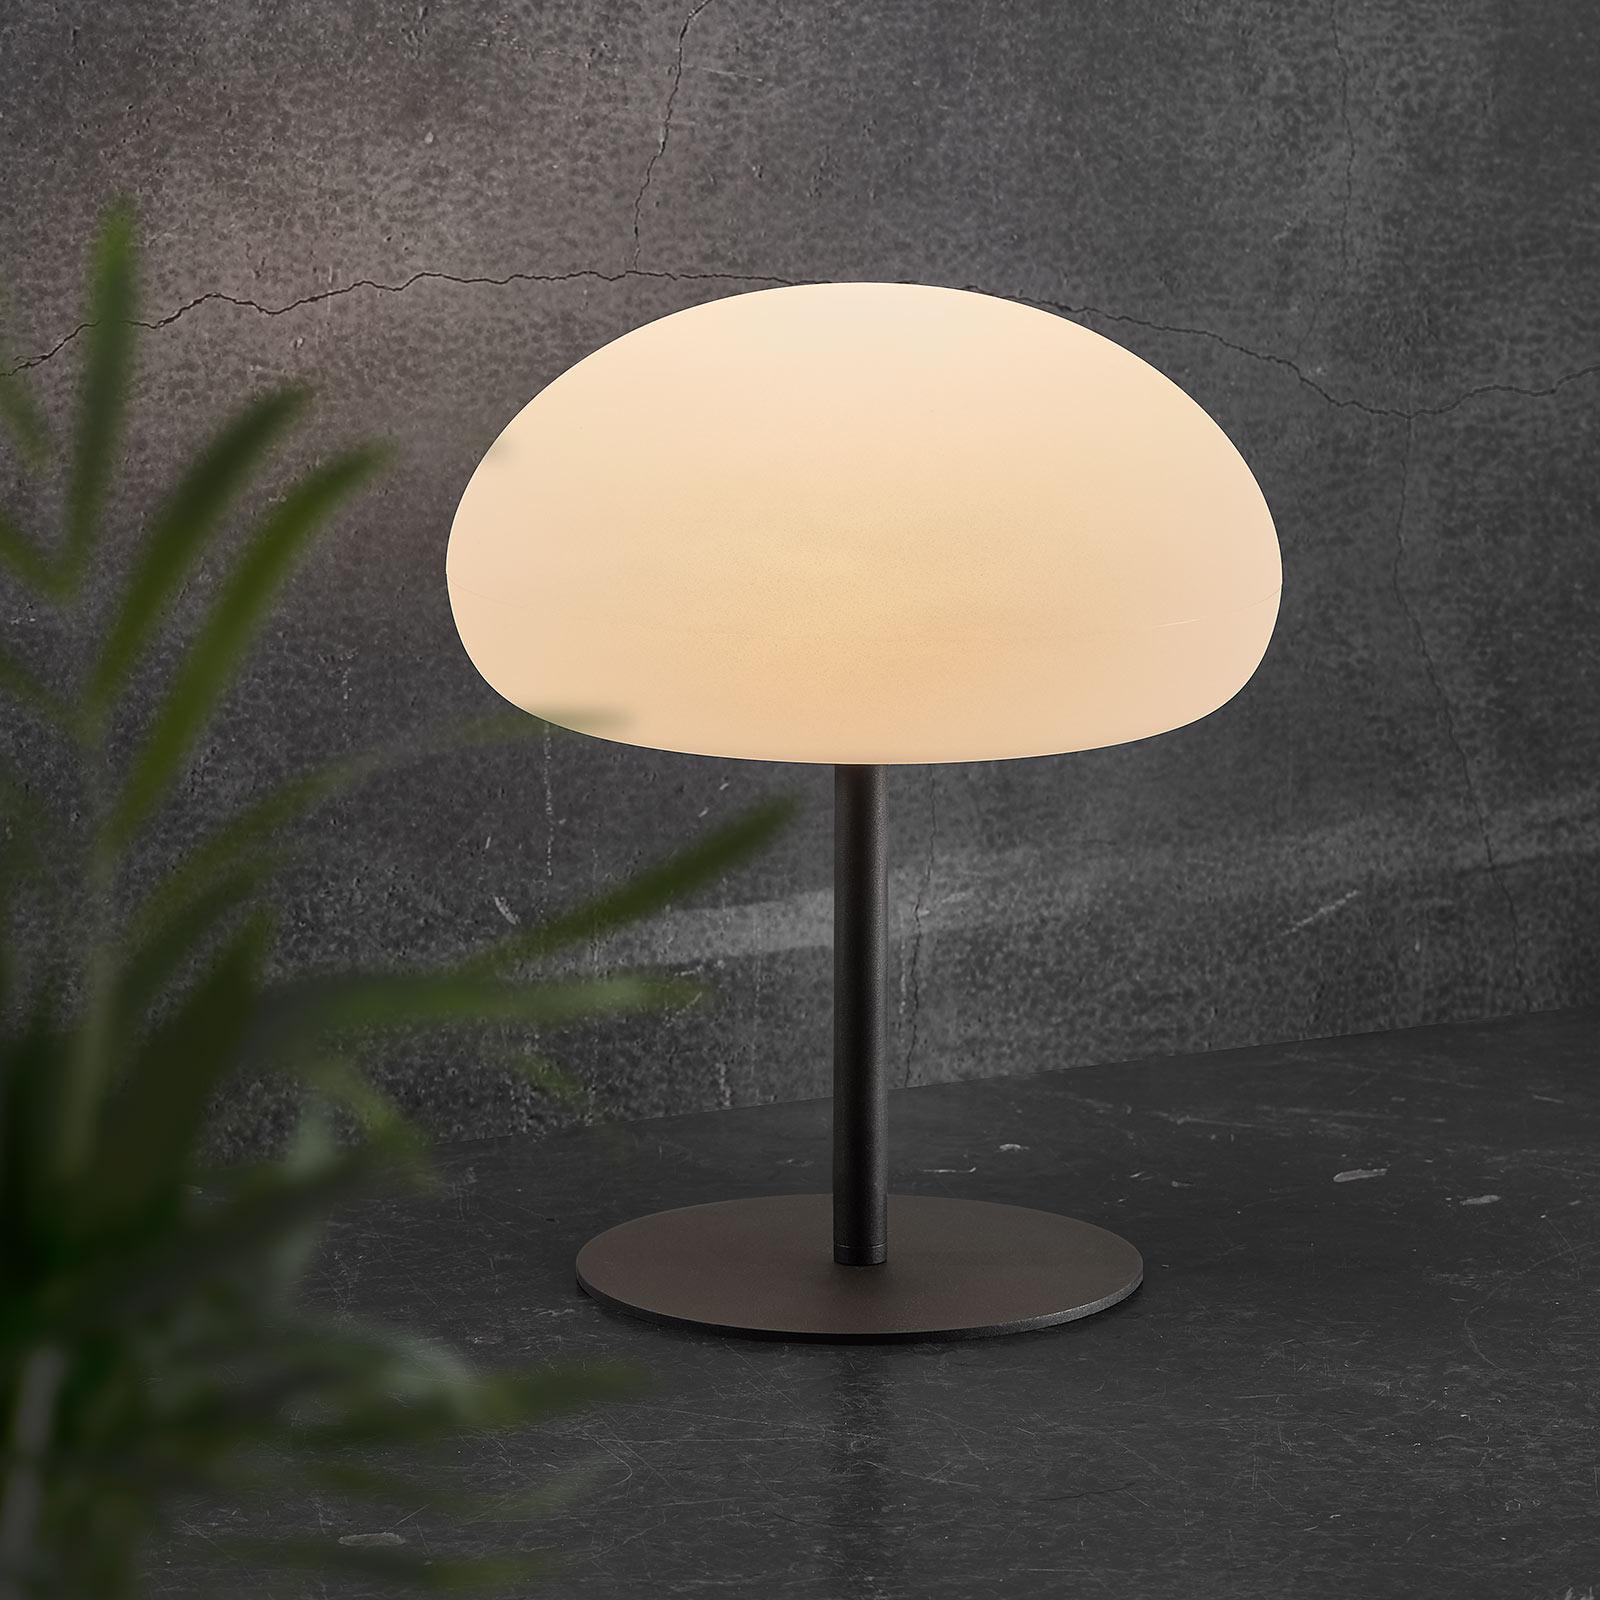 Lampa stołowa LED Sponge table, akumulator, 40,5cm